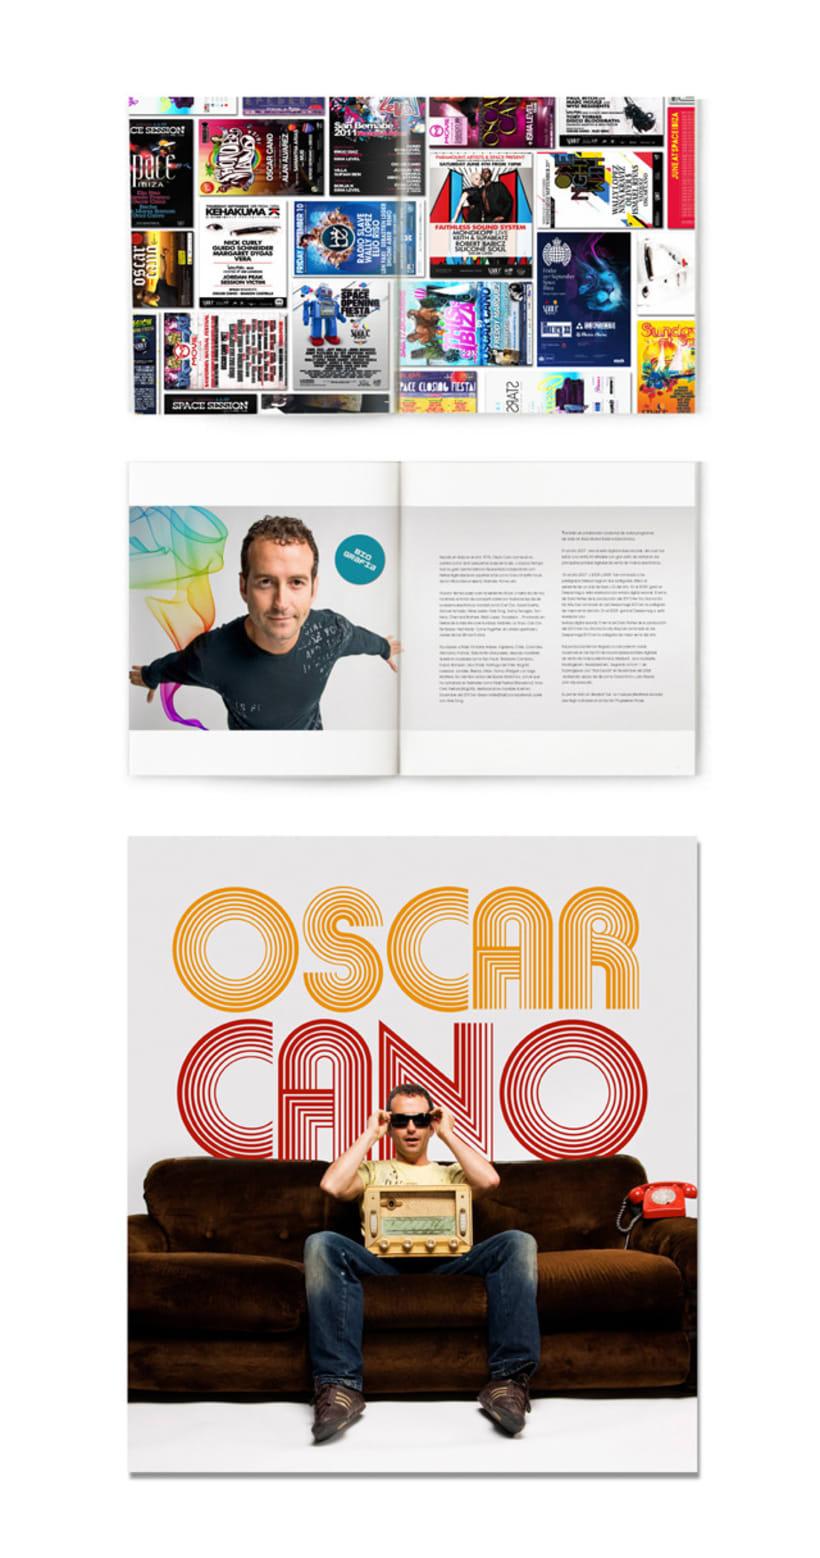 Oscar Cano 2